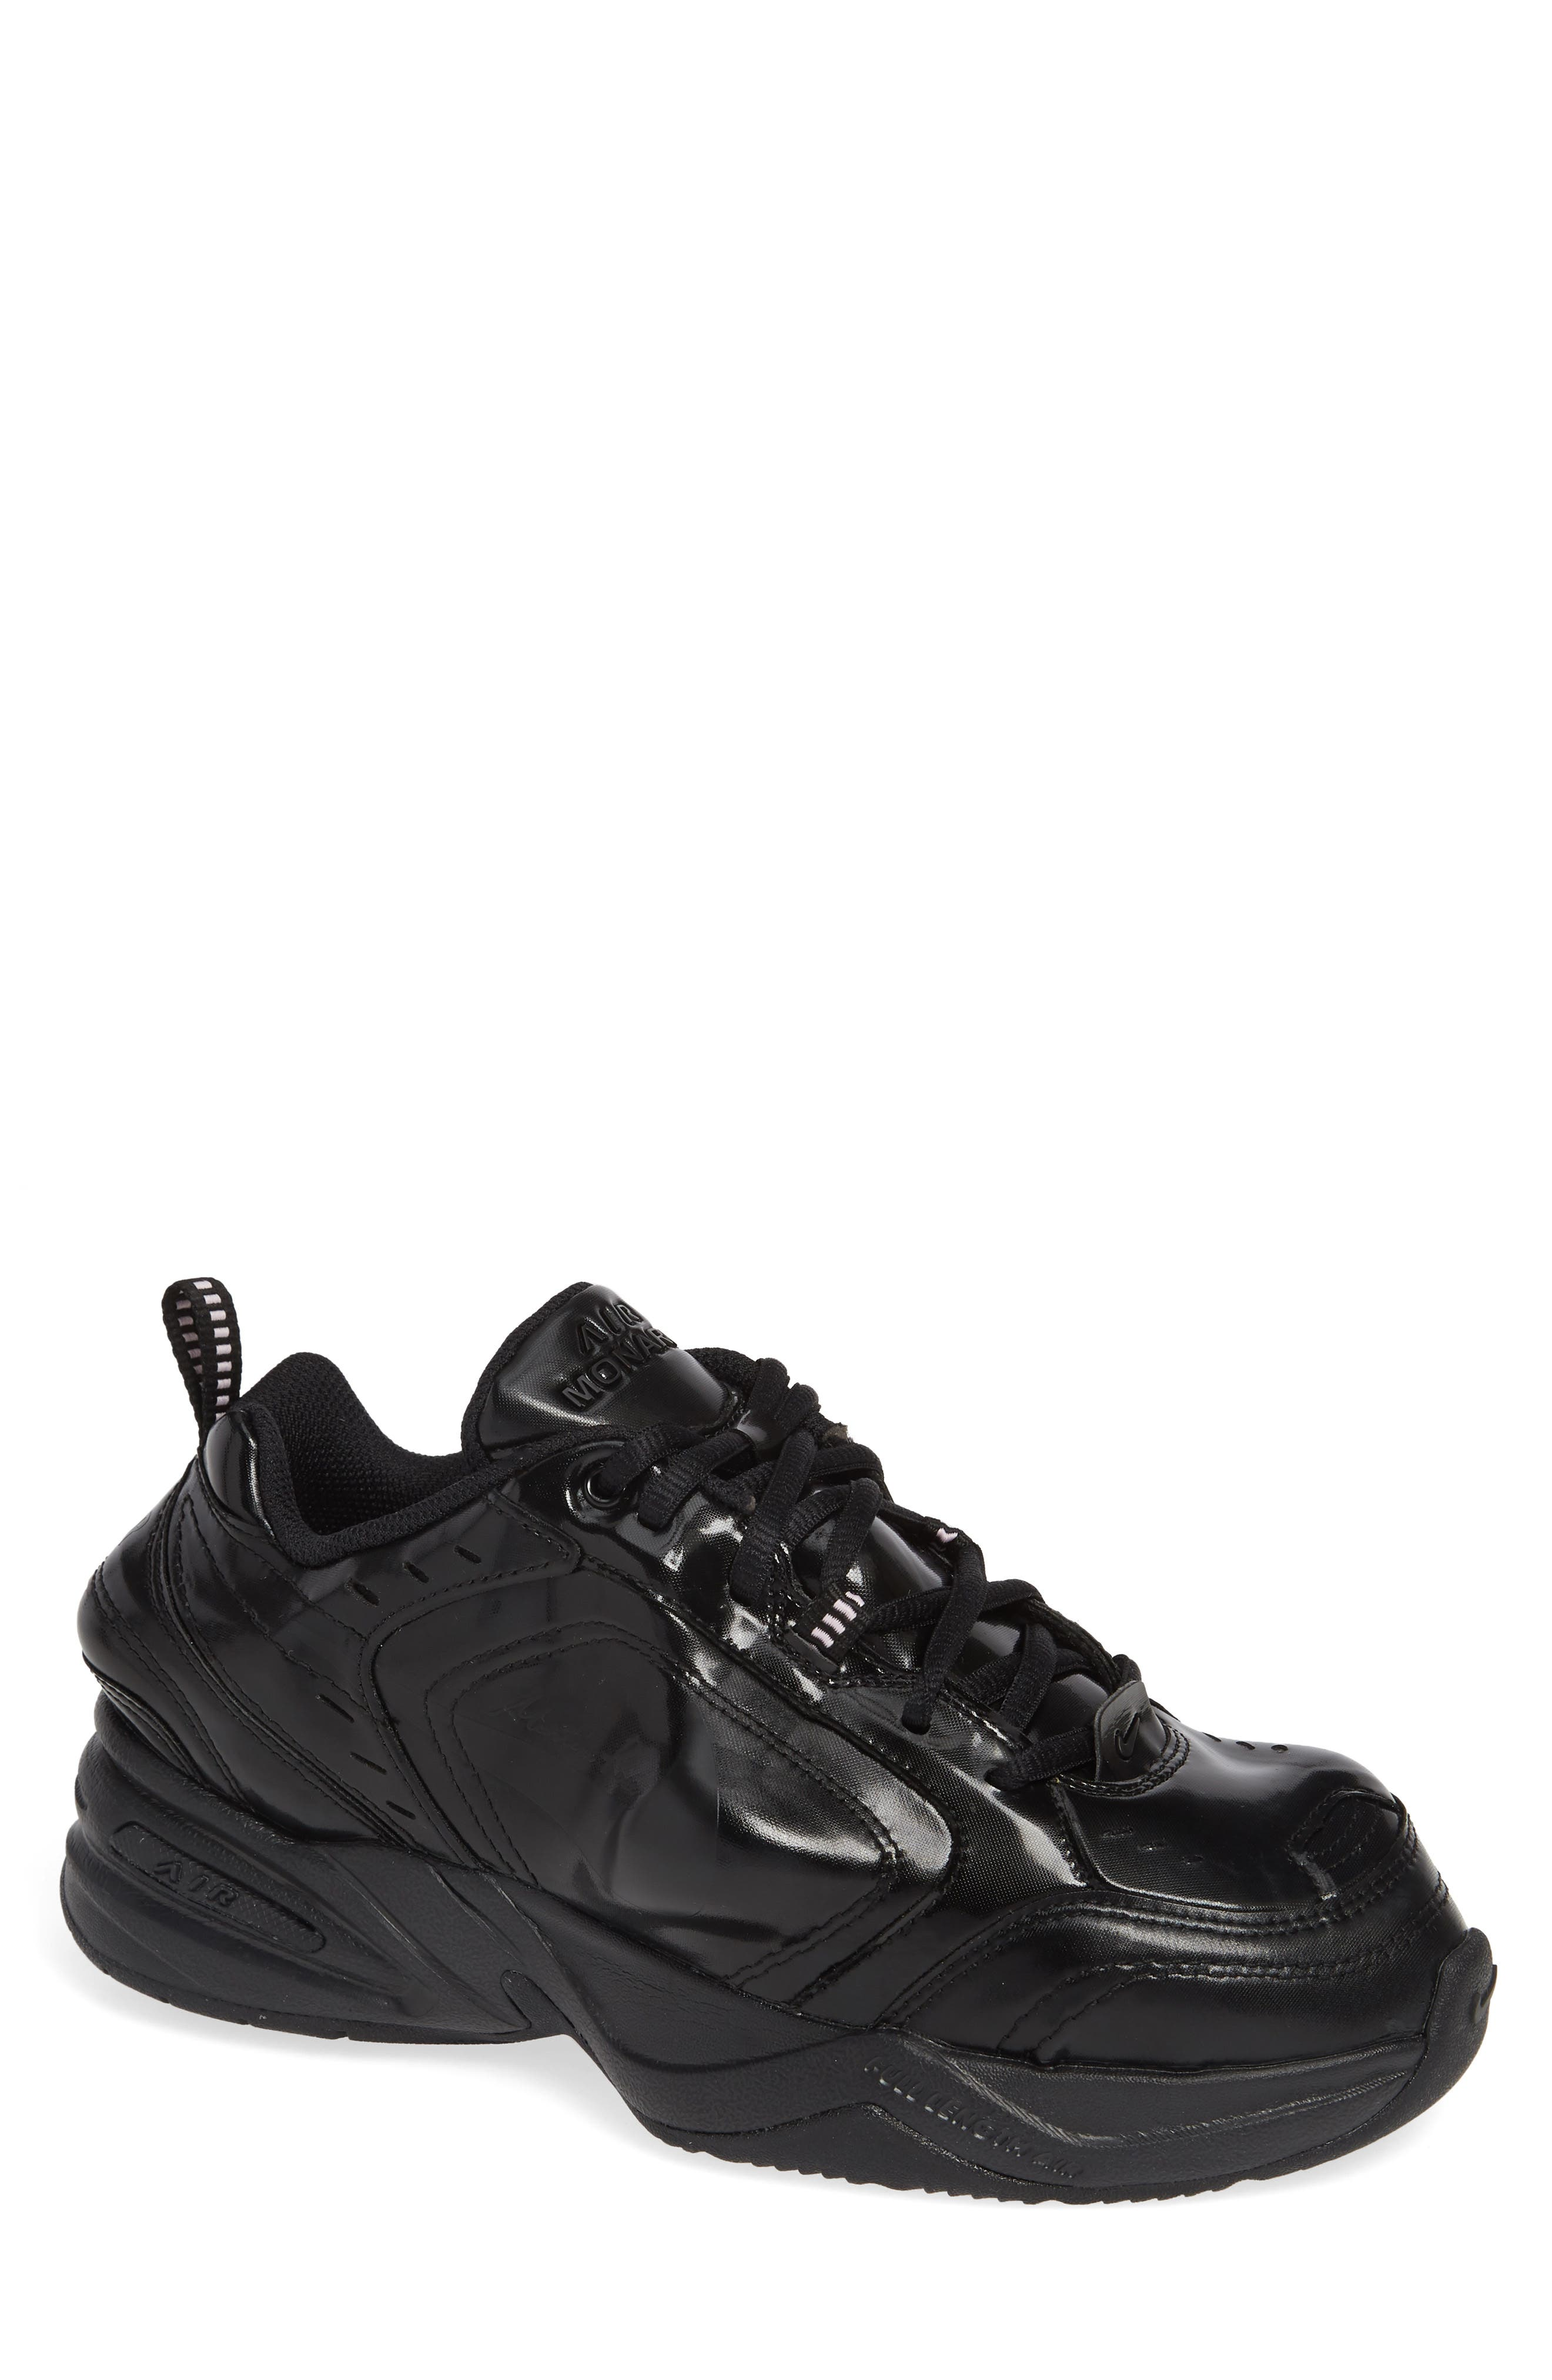 x Martine Rose Air Monarch IV Sneaker,                             Main thumbnail 1, color,                             BLACK/ SOFT PINK